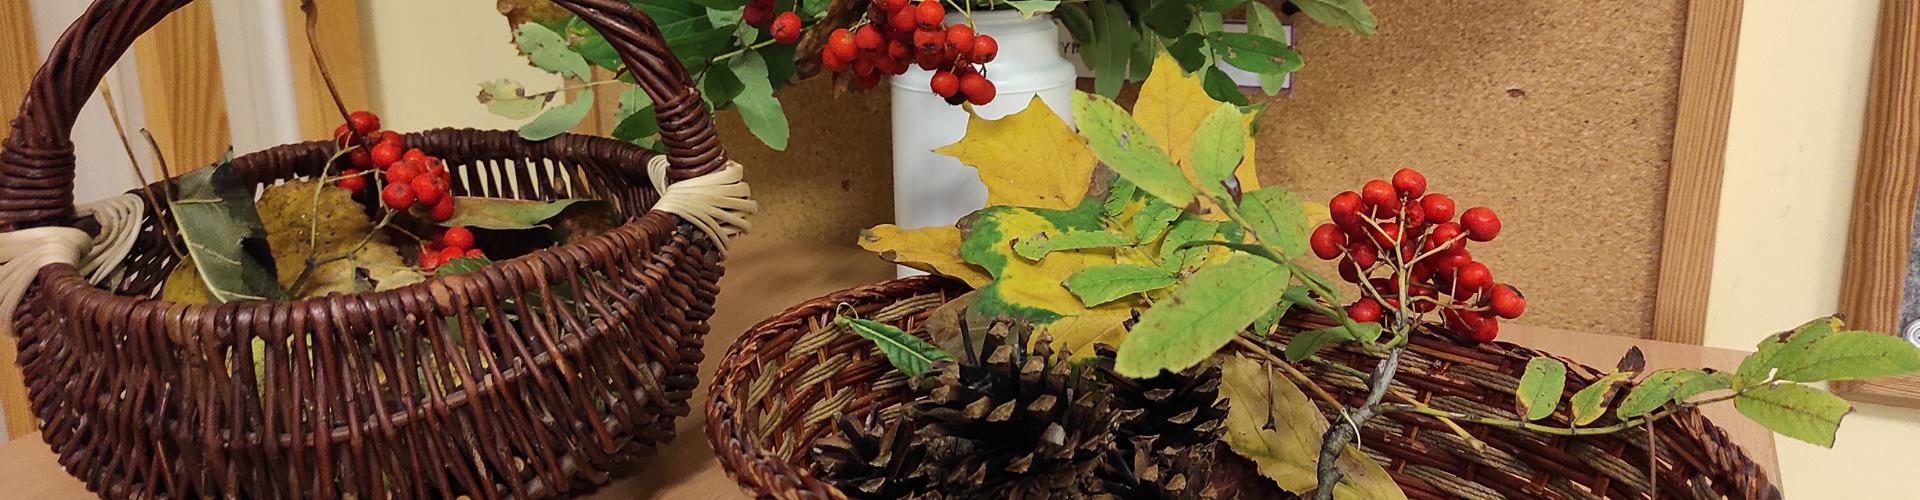 Już jesień...